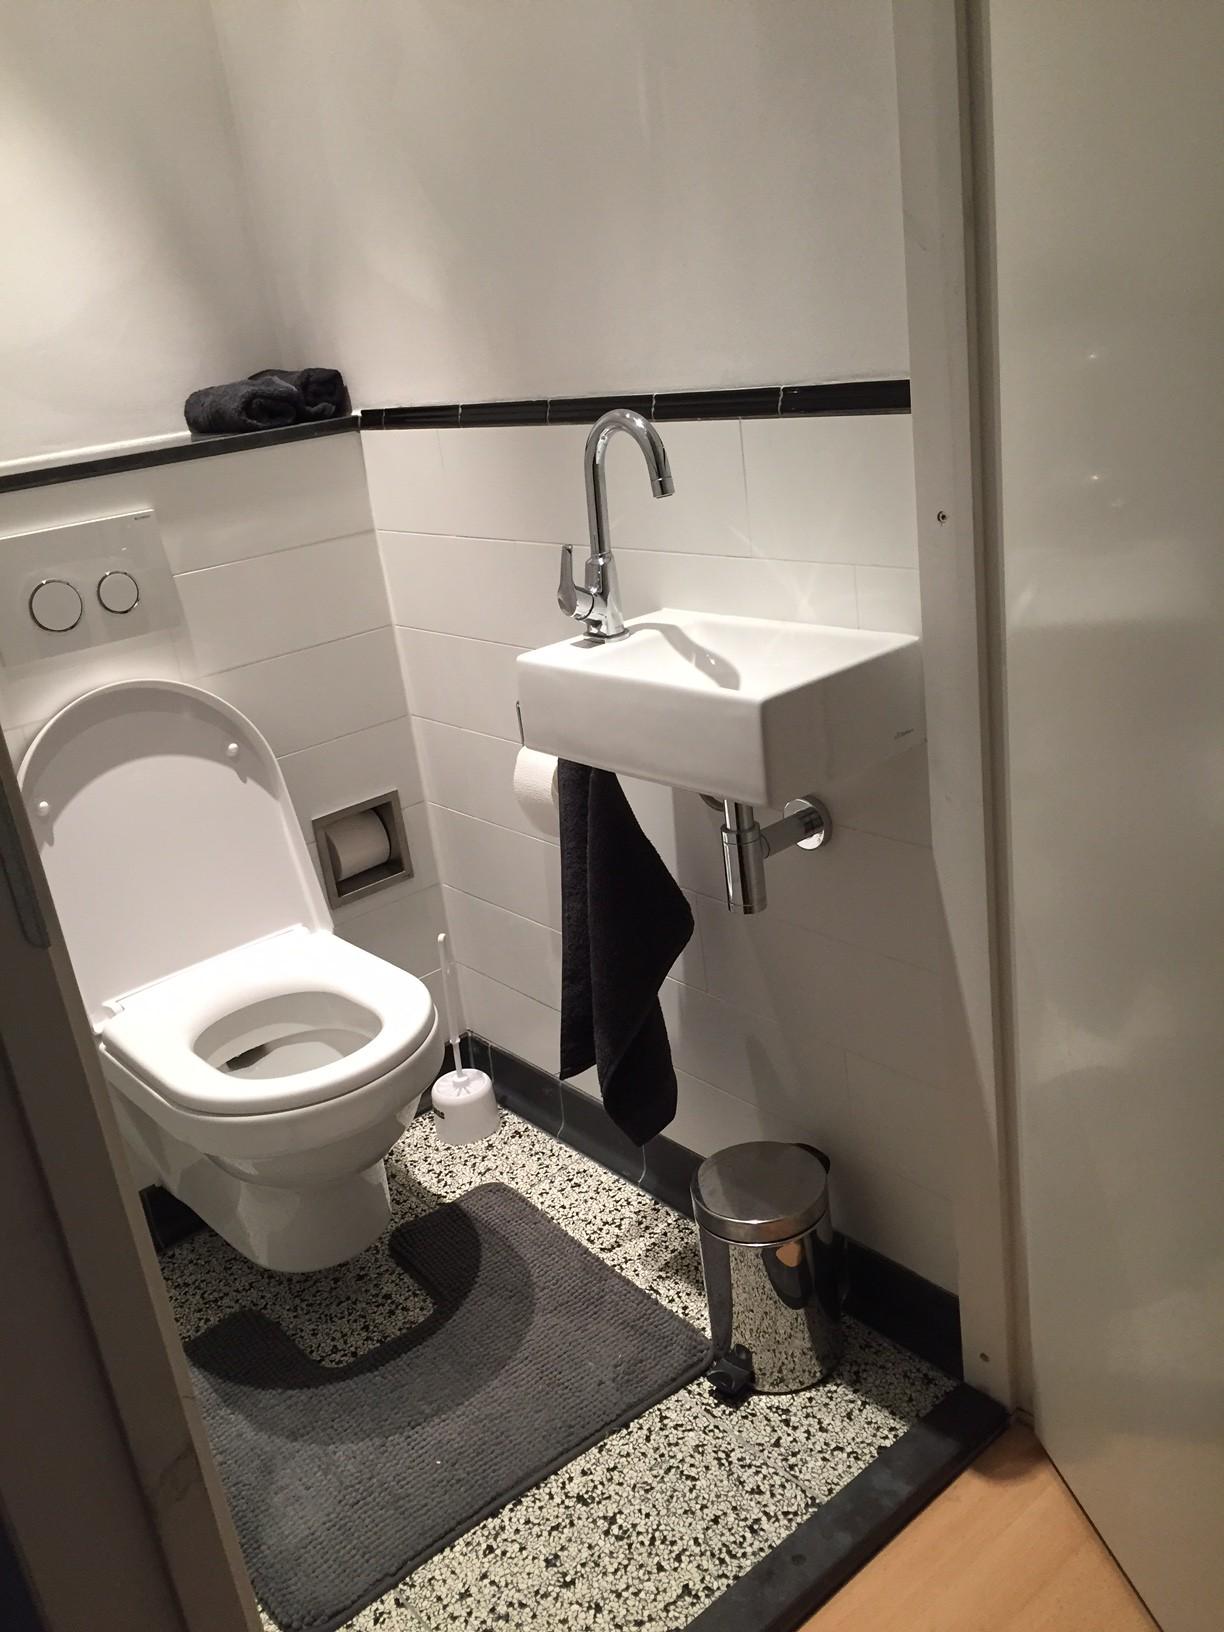 Witte Terrastegels 40x40.Granito Tegels In Toilet Met Zwarte Plint Tegelaer Tegelhandel